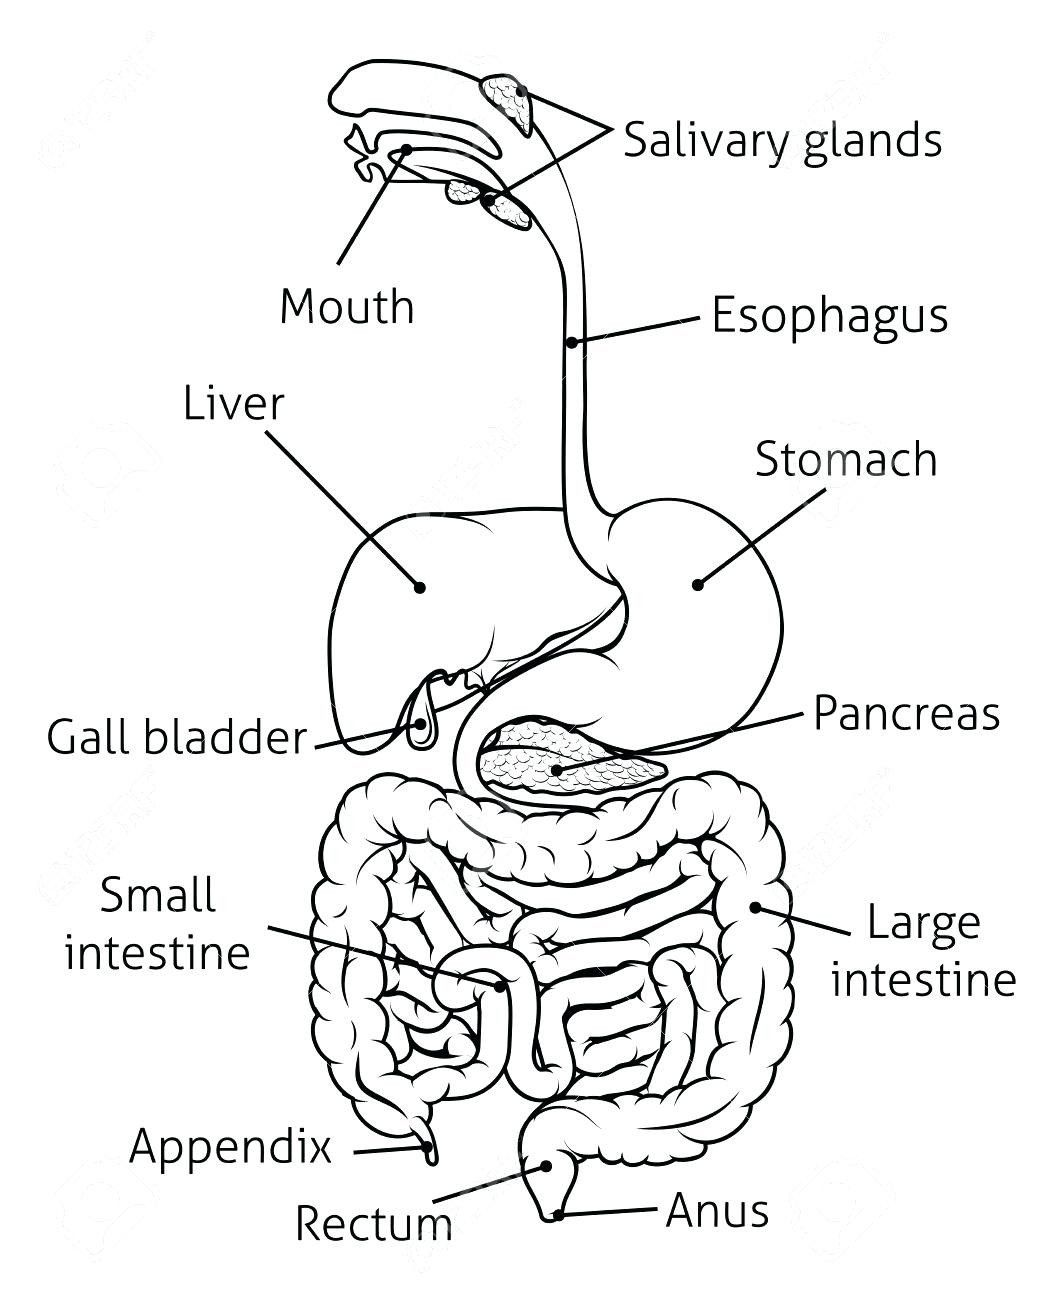 Pin By Aaron Rathinam On Nursing Med Digestive System Diagram Human Digestive System Digestive System For Kids